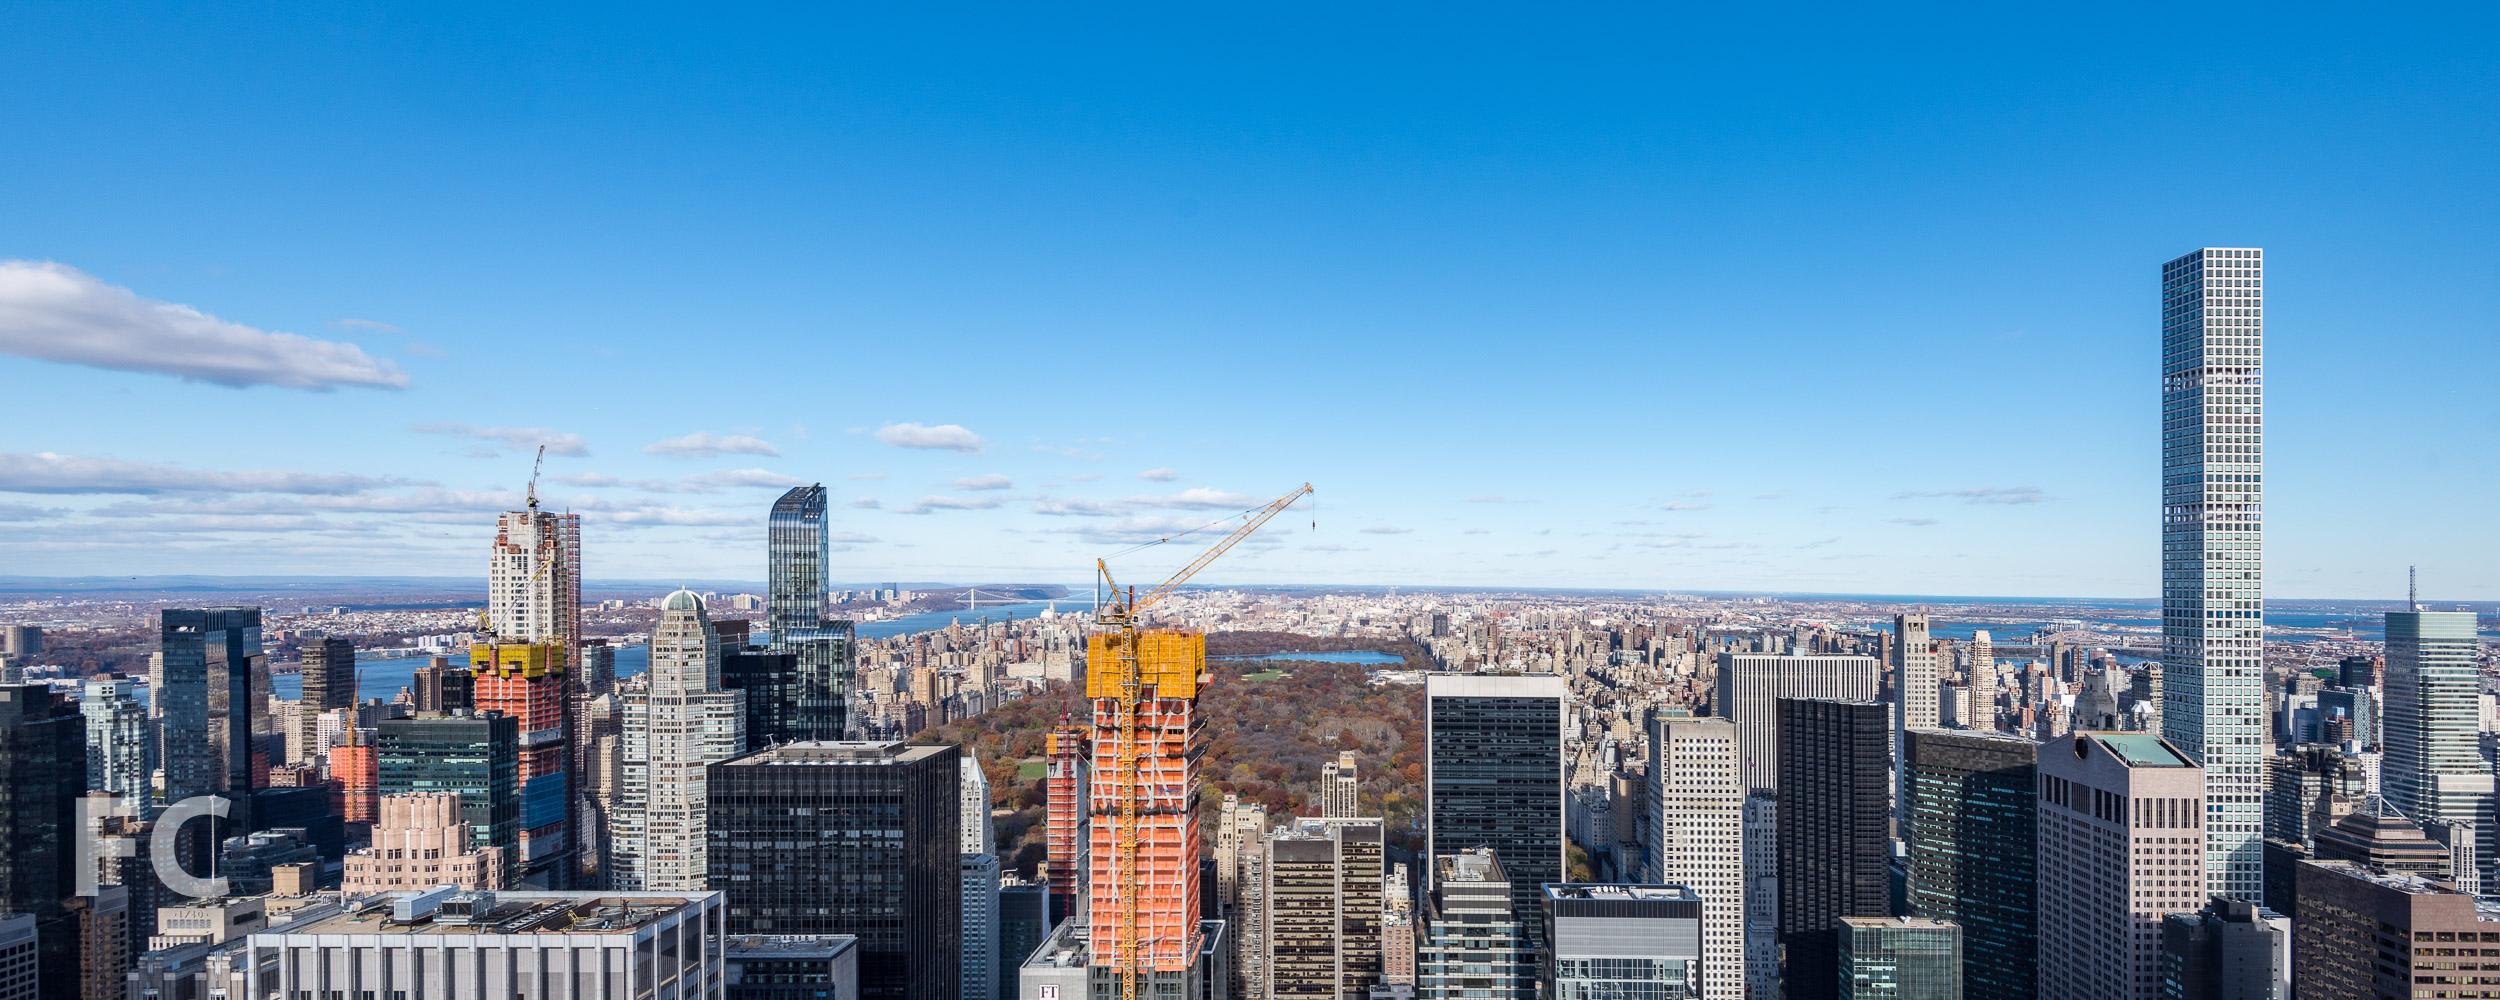 53 W 53 (center) on the Midtown skyline.